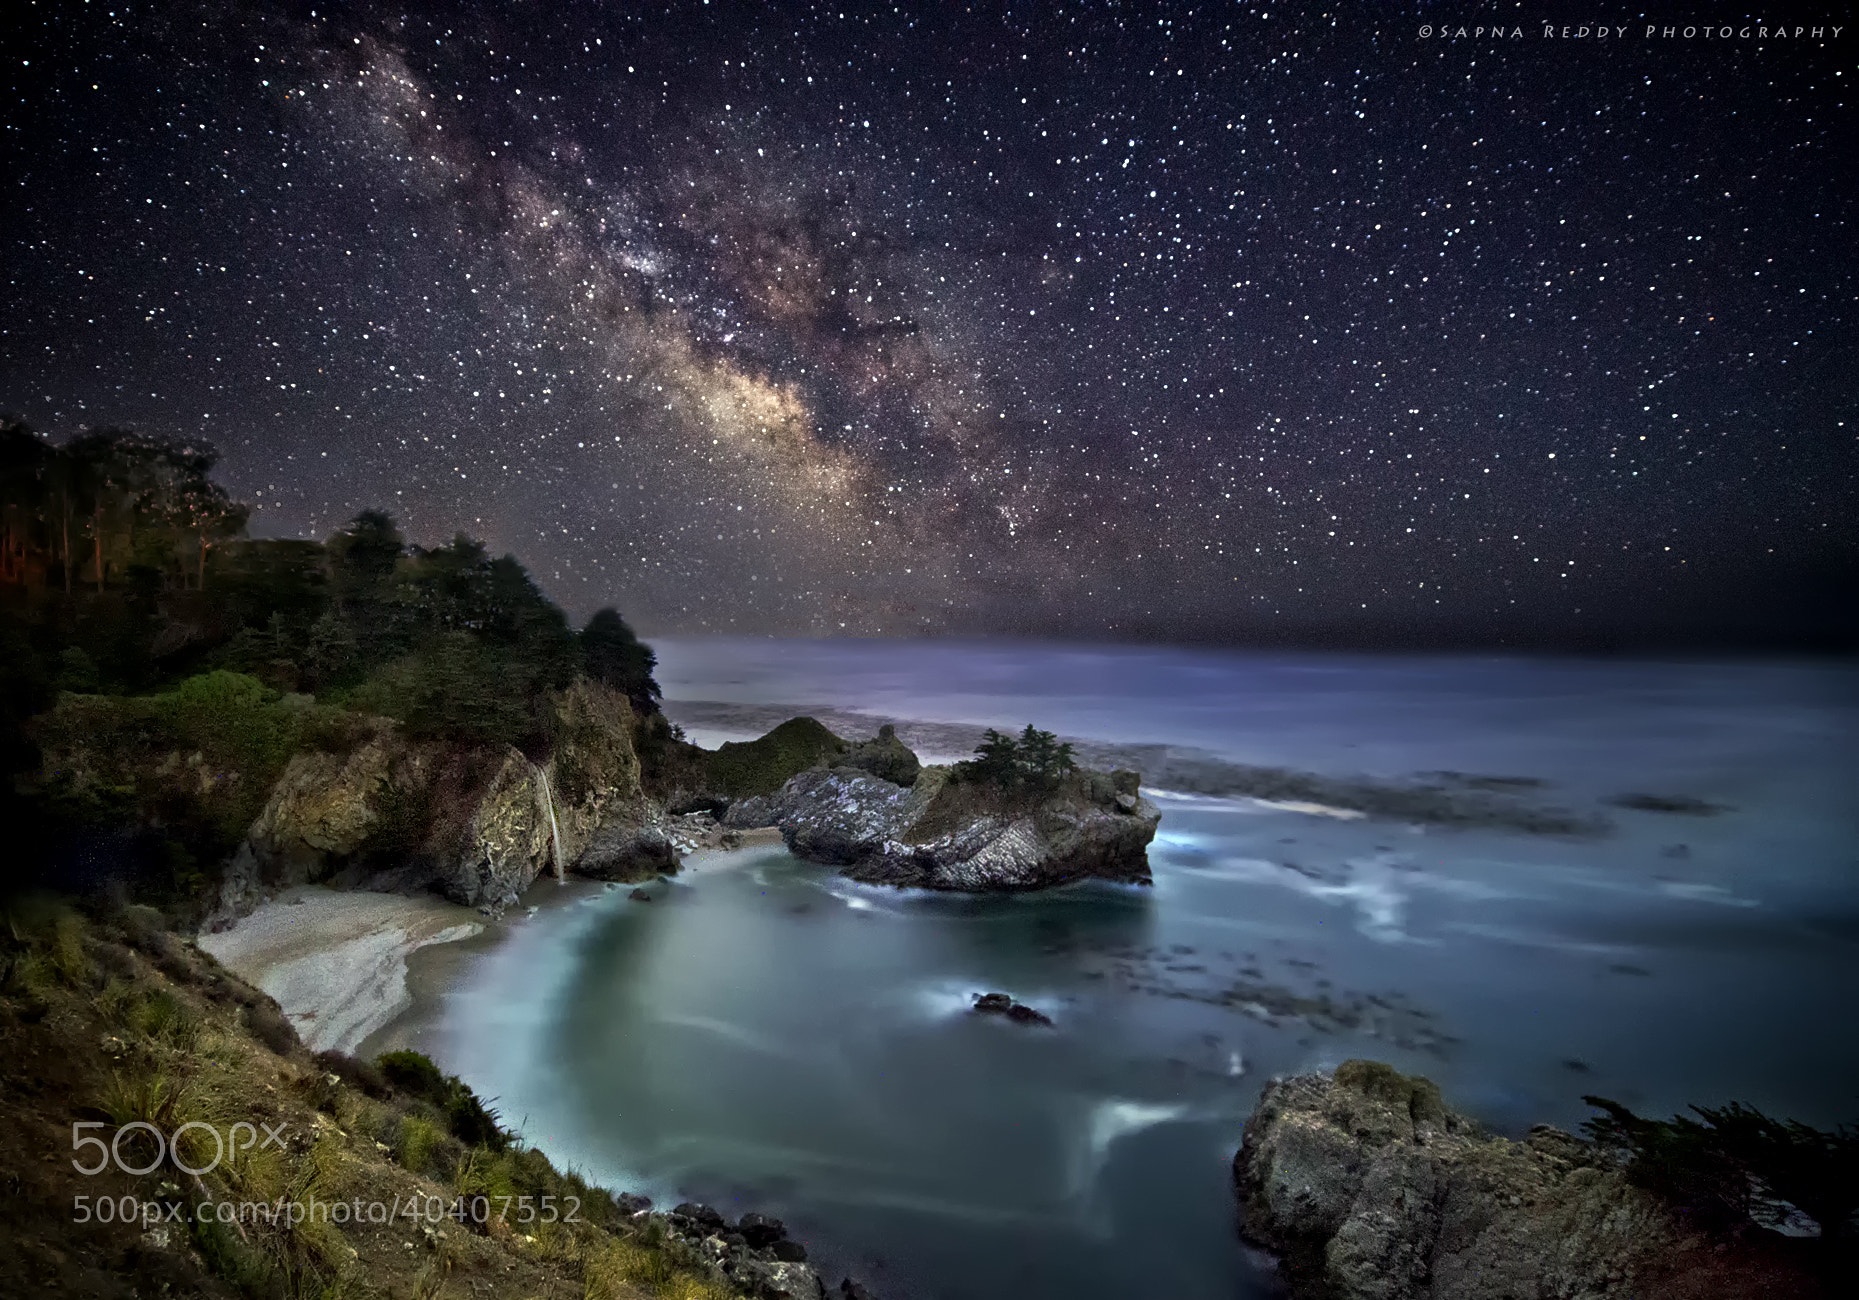 Photograph Milky way to Mc Way Falls. by Sapna Reddy on 500px